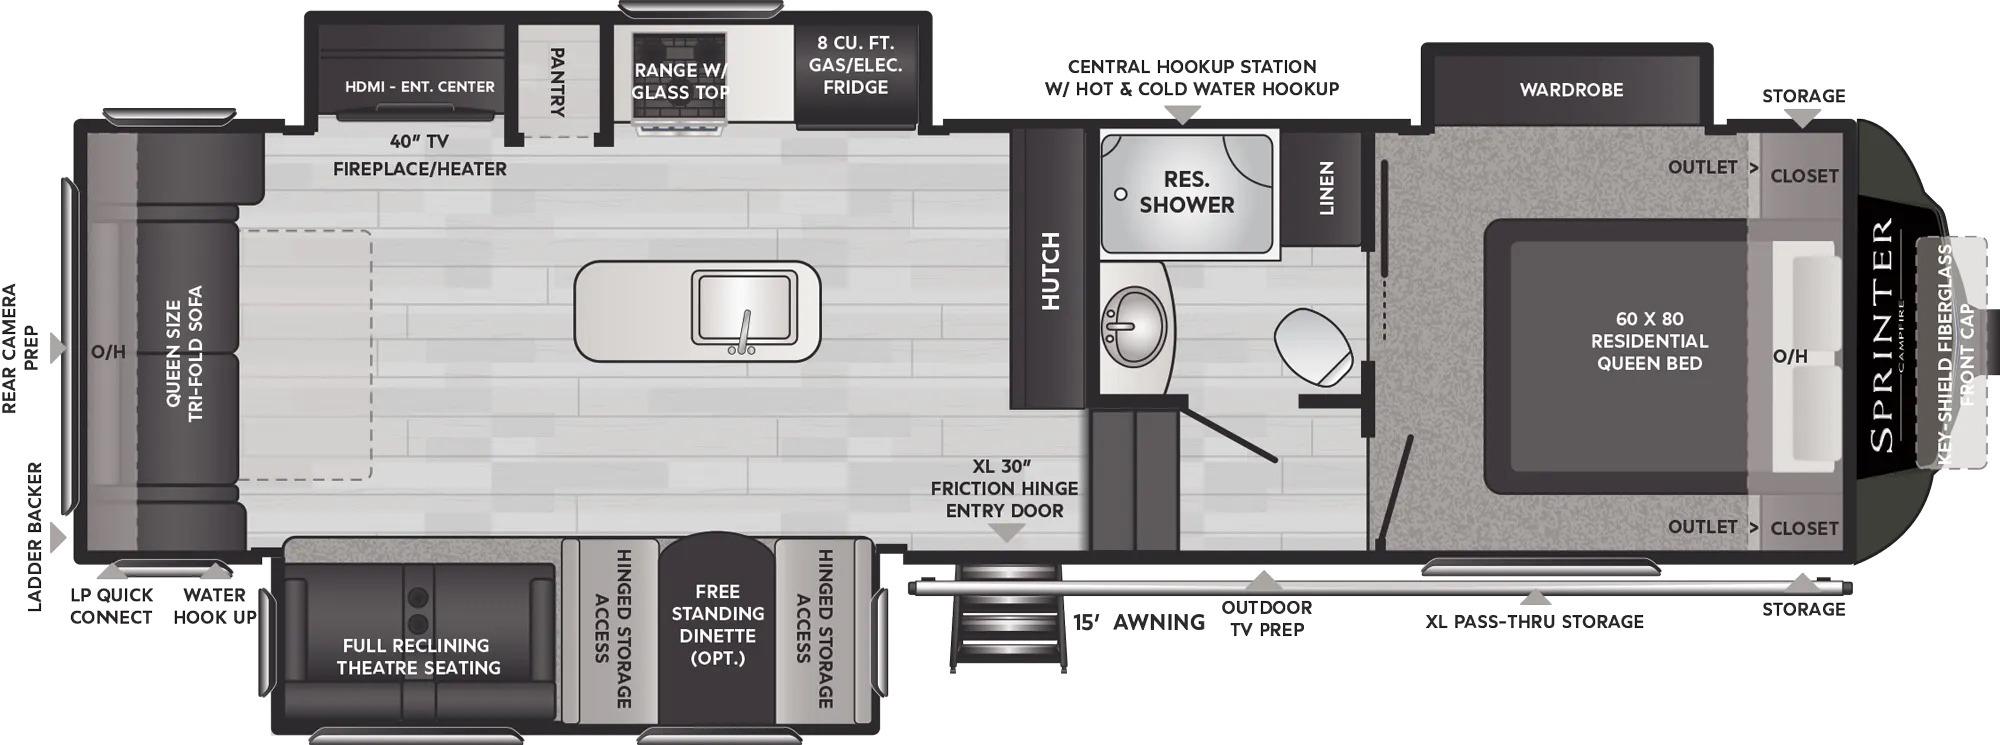 View Floor Plan for 2022 KEYSTONE SPRINTER 30RL